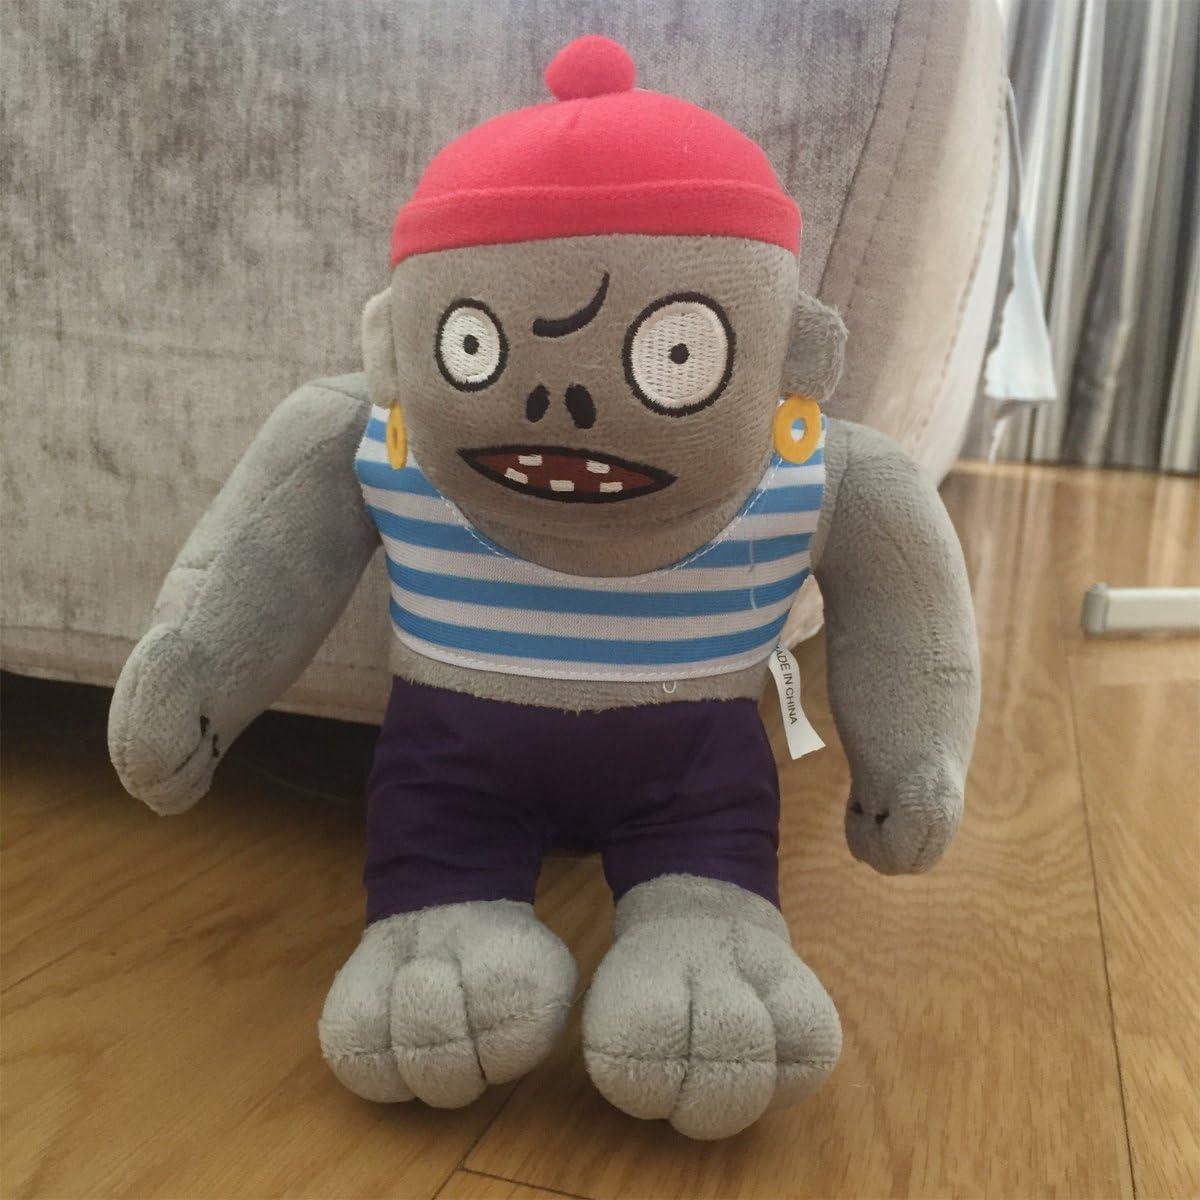 TavasHome Plants vs Zombies 2 PVZ Figures Plush Baby Staff Toy Stuffed Soft Doll 13cm-35cm Soft PP Cotton (Gargantuar Pirate Zombie)